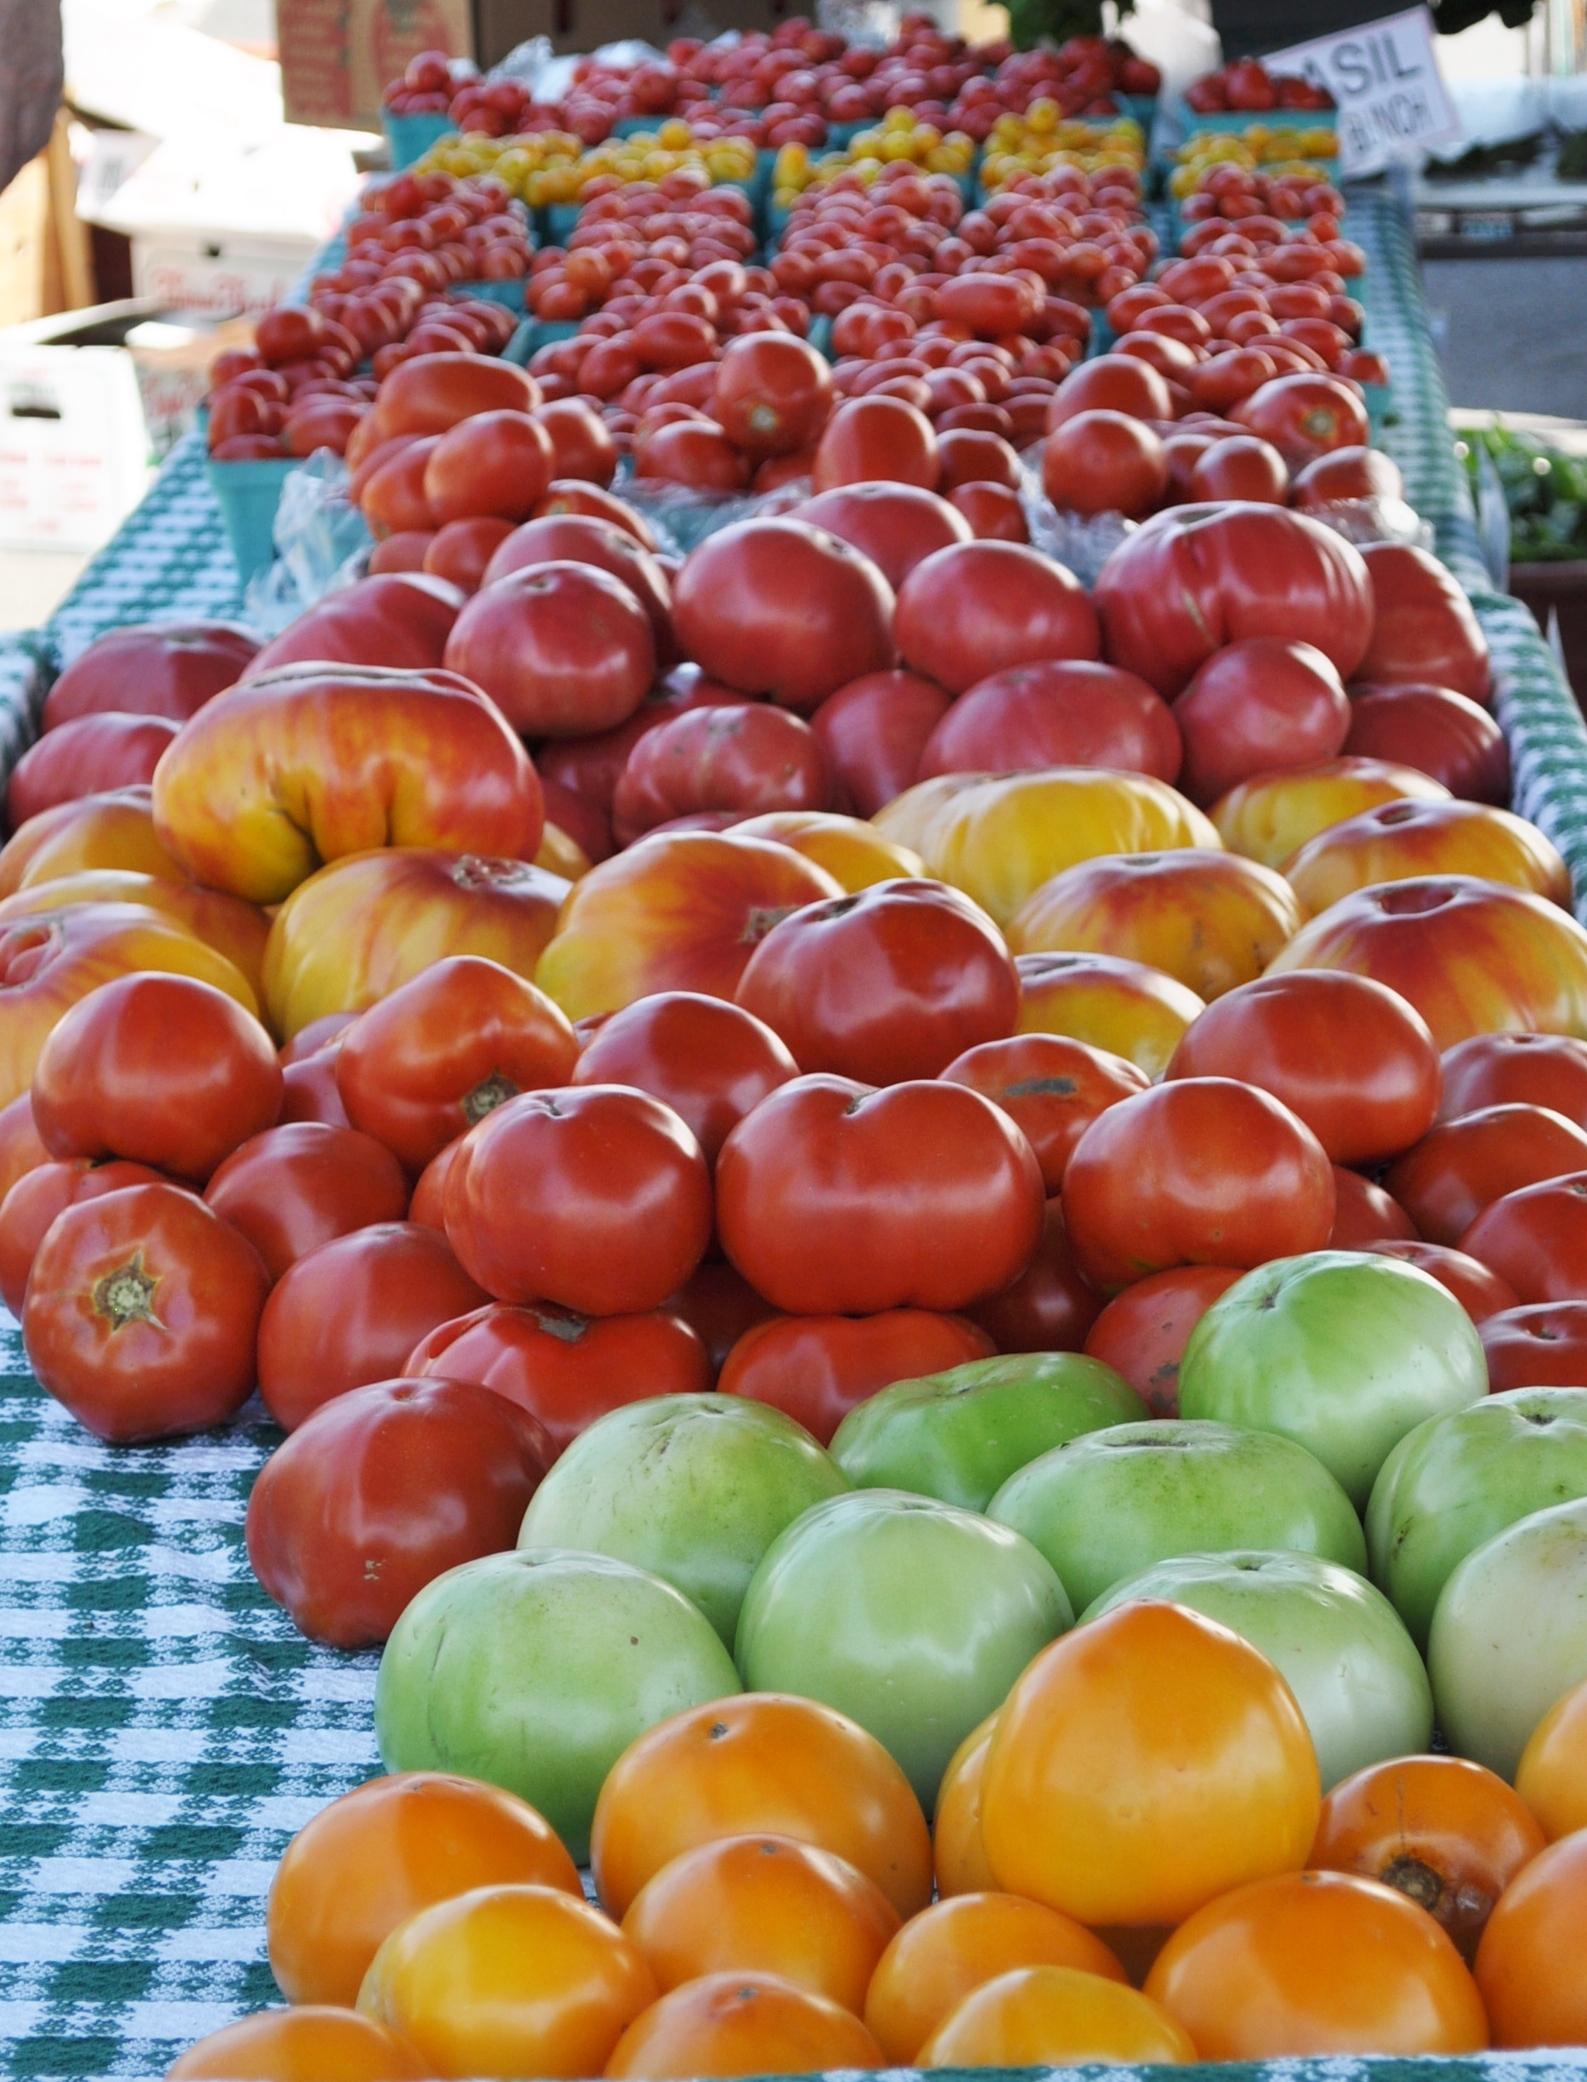 3a31b50b027d7aca0b41_tomatoes.JPG